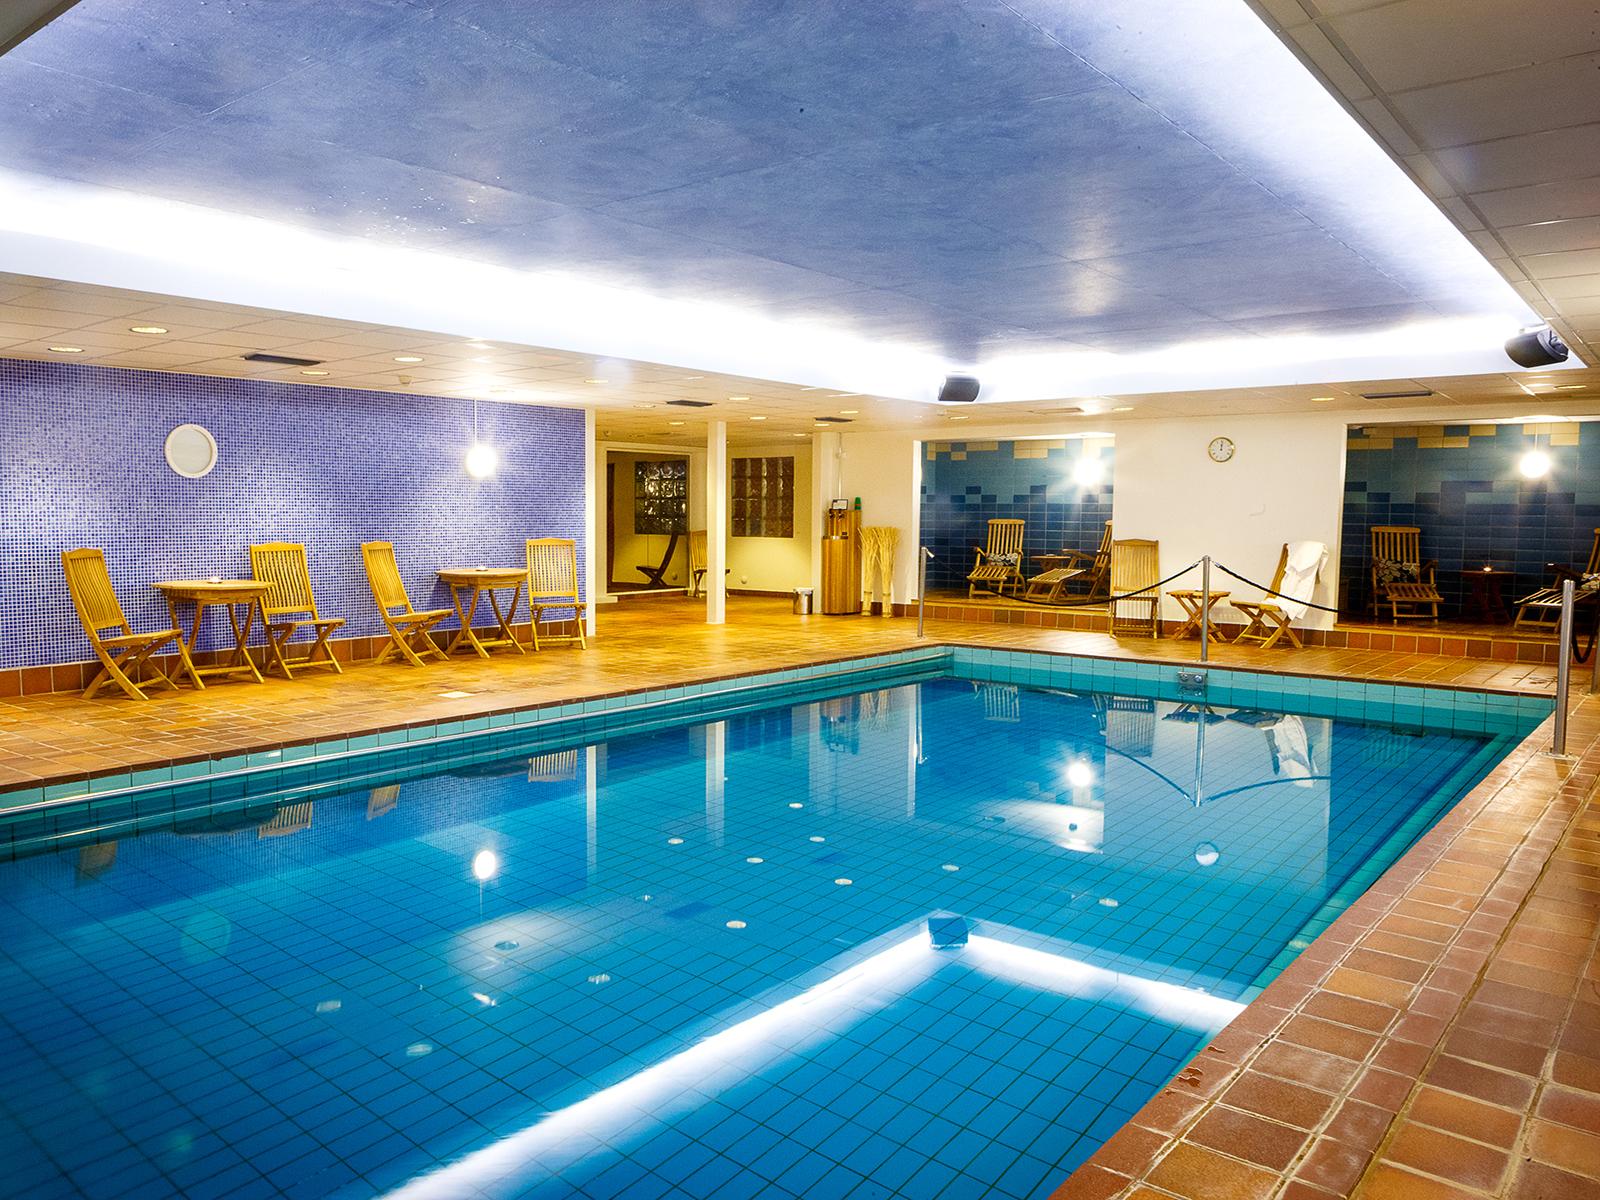 hotell i skövde med pool